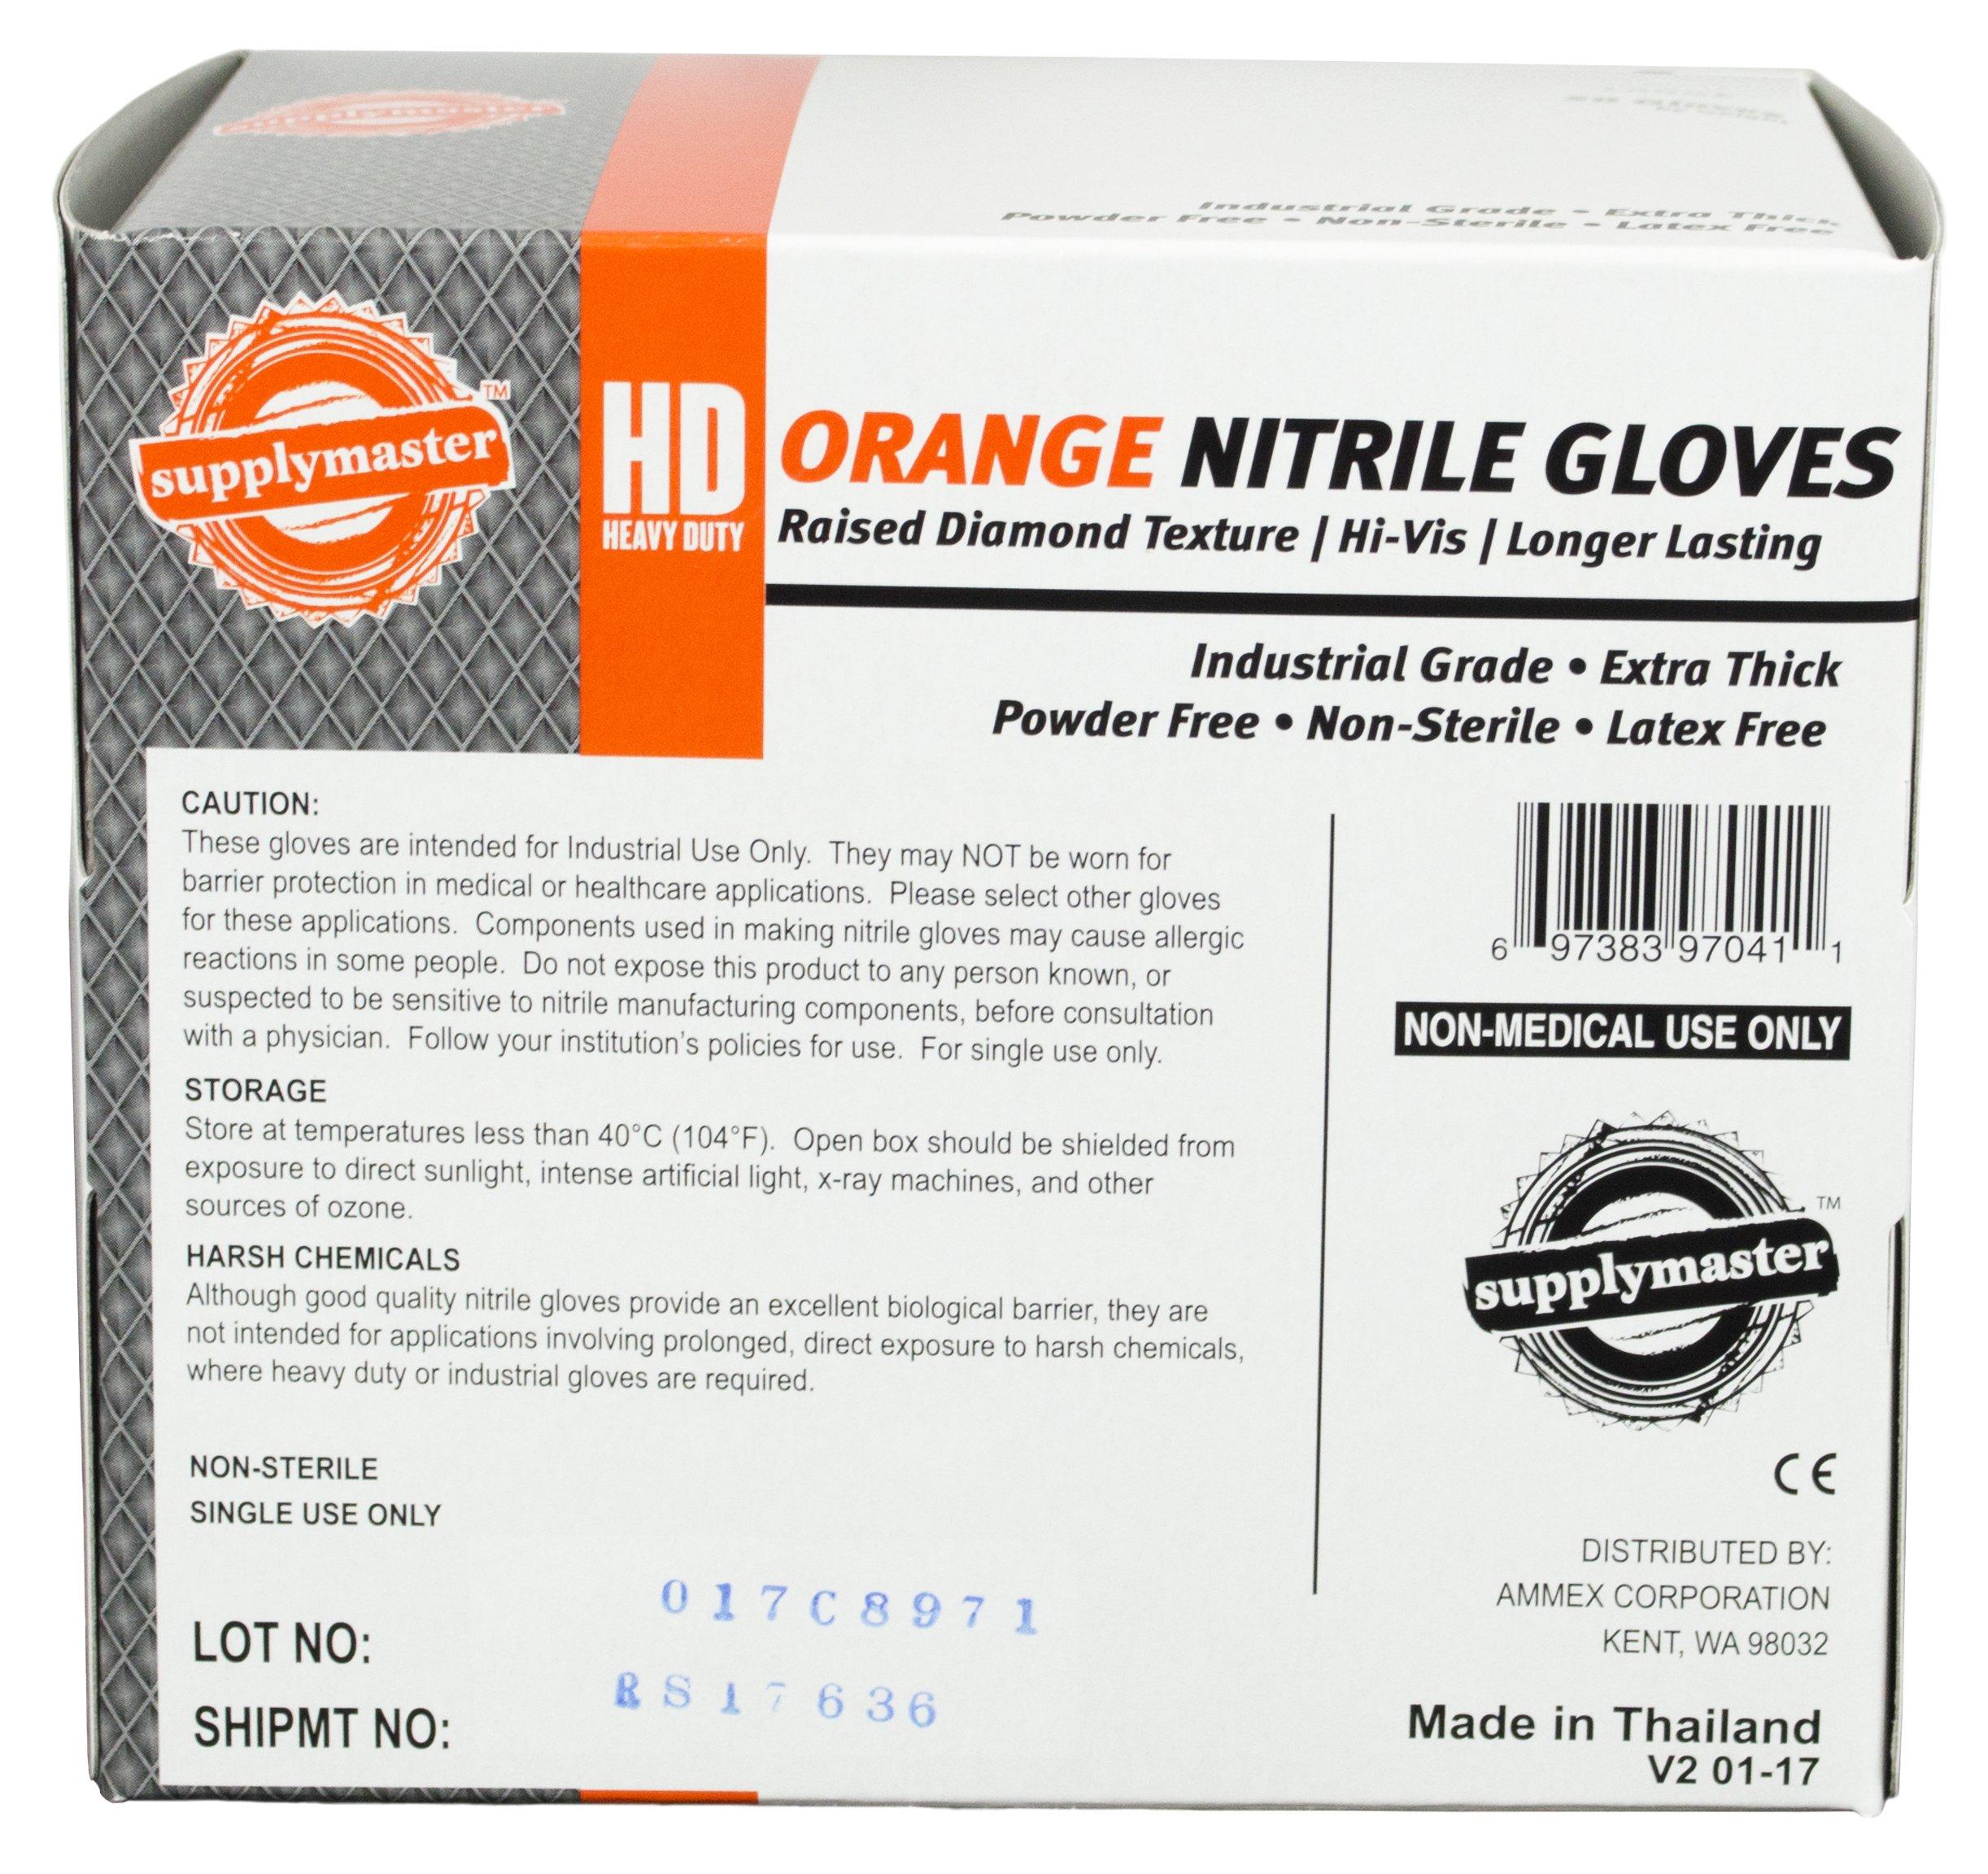 SupplyMaster - SMDTON8M - Diamond Texture Nitrile Gloves - Disposable, Powder Free, Industrial, 8 mil, Medium, Orange (Case of 200) by SupplyMaster (Image #3)